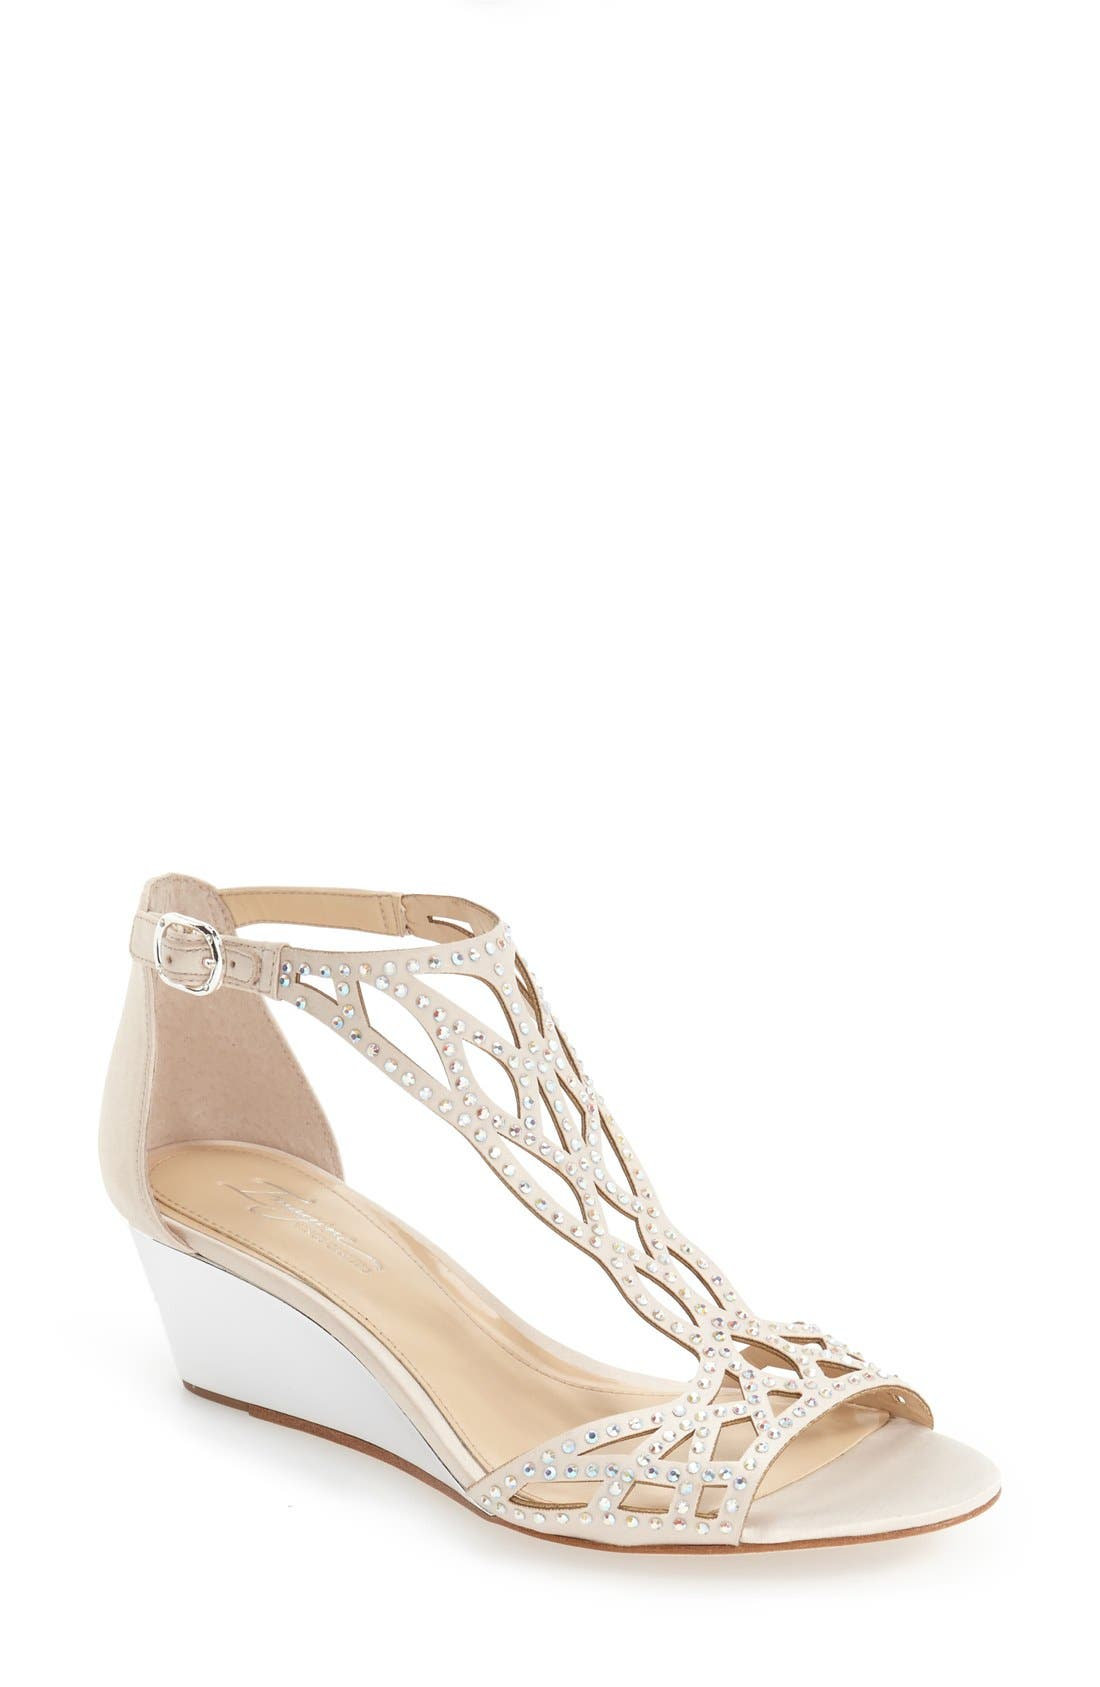 Mens Cream and Golden Design Wedding Shoes MJ014882